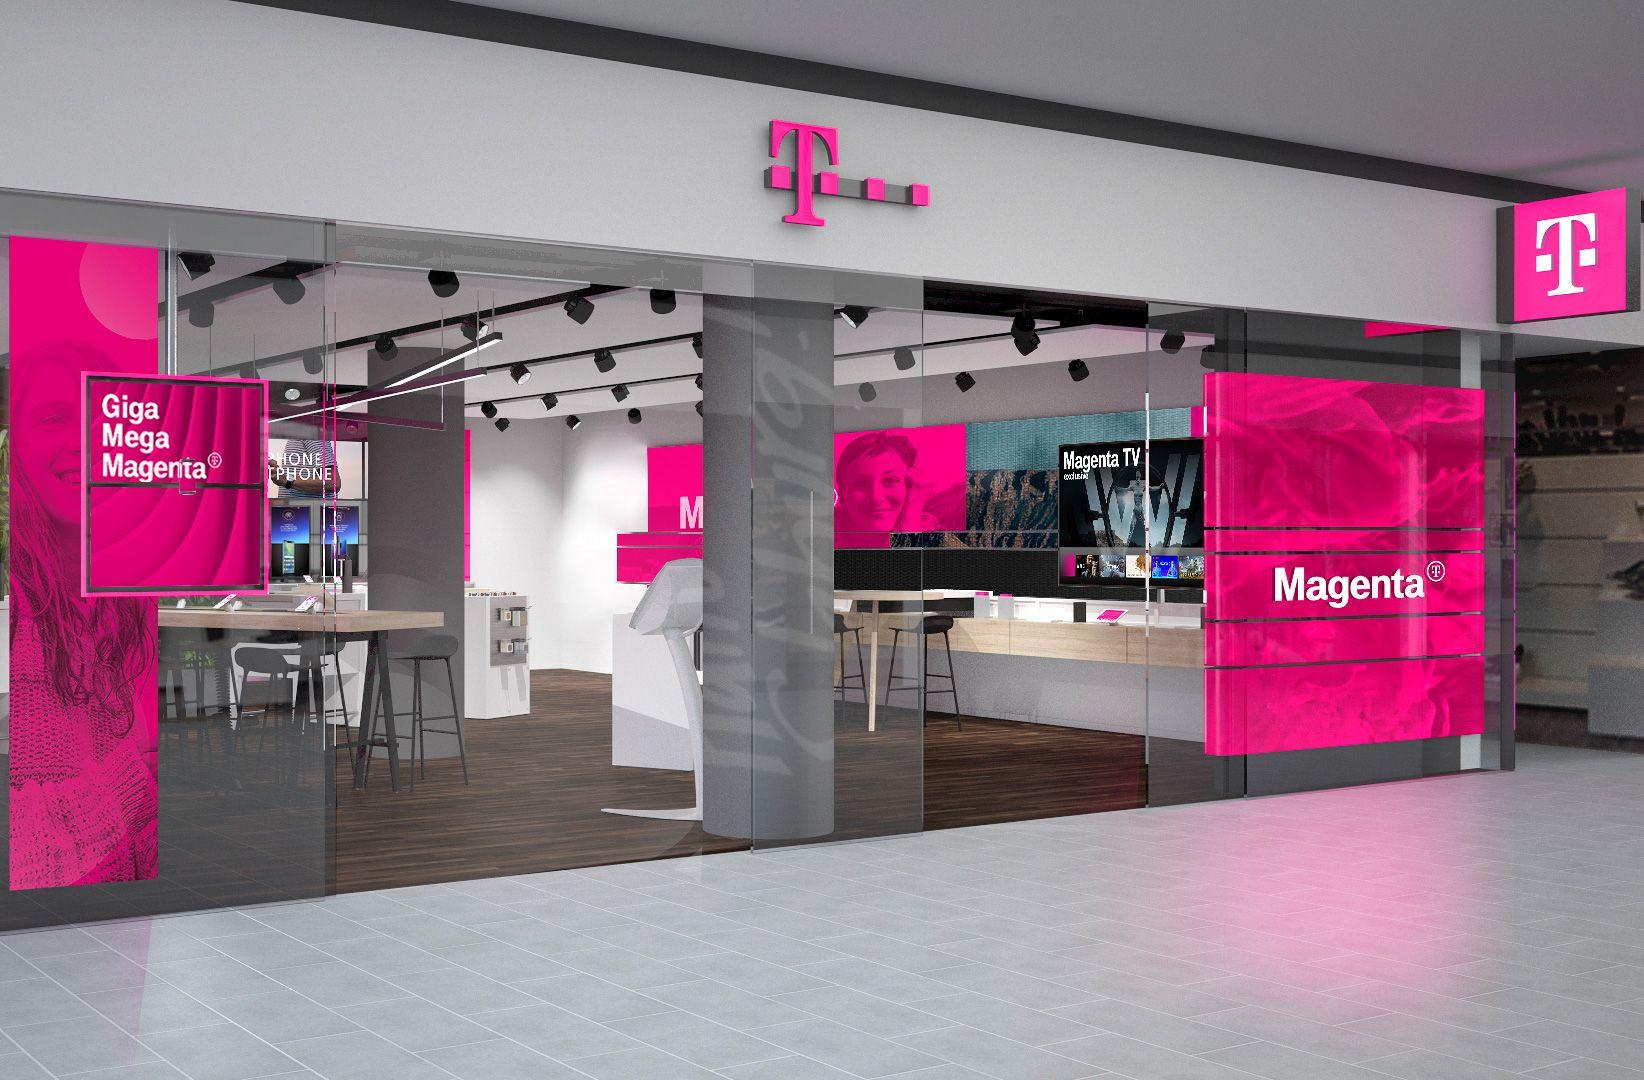 TMobile Austria and UPC Austria create new brand that